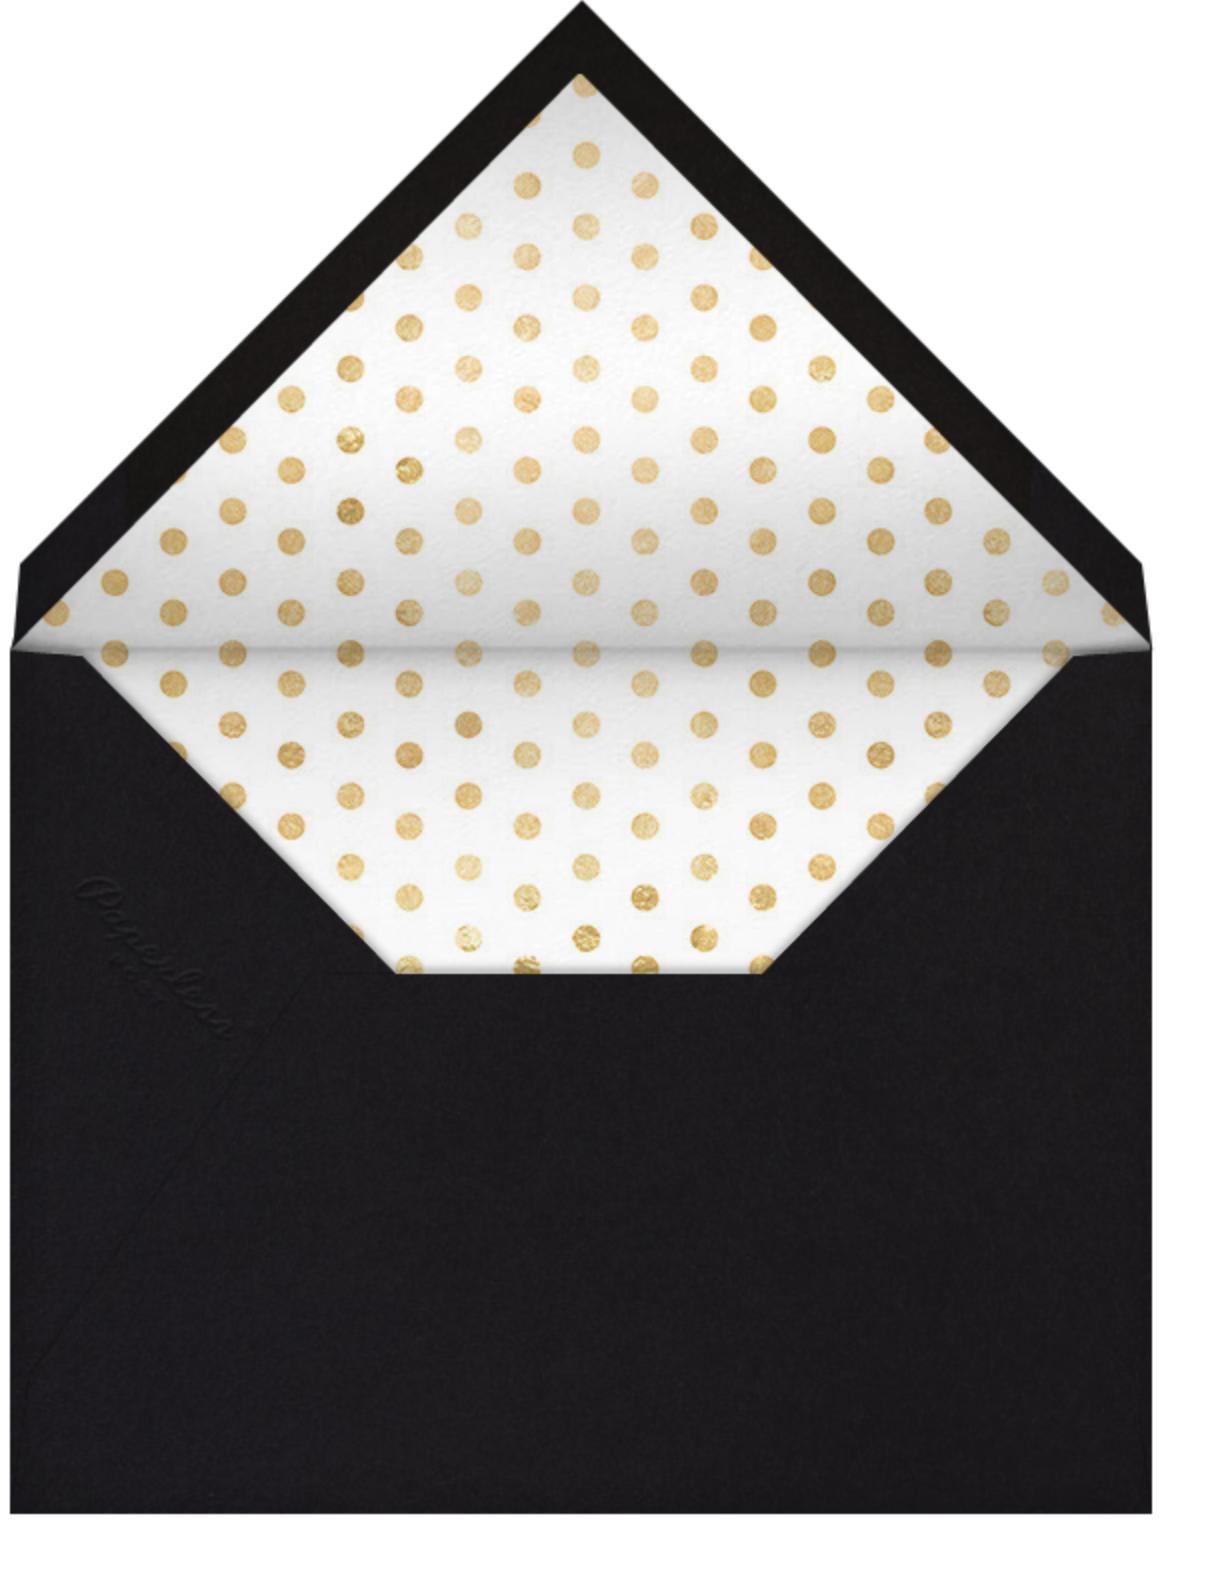 The Highest Bidder - Paperless Post - Charity and fundraiser  - envelope back